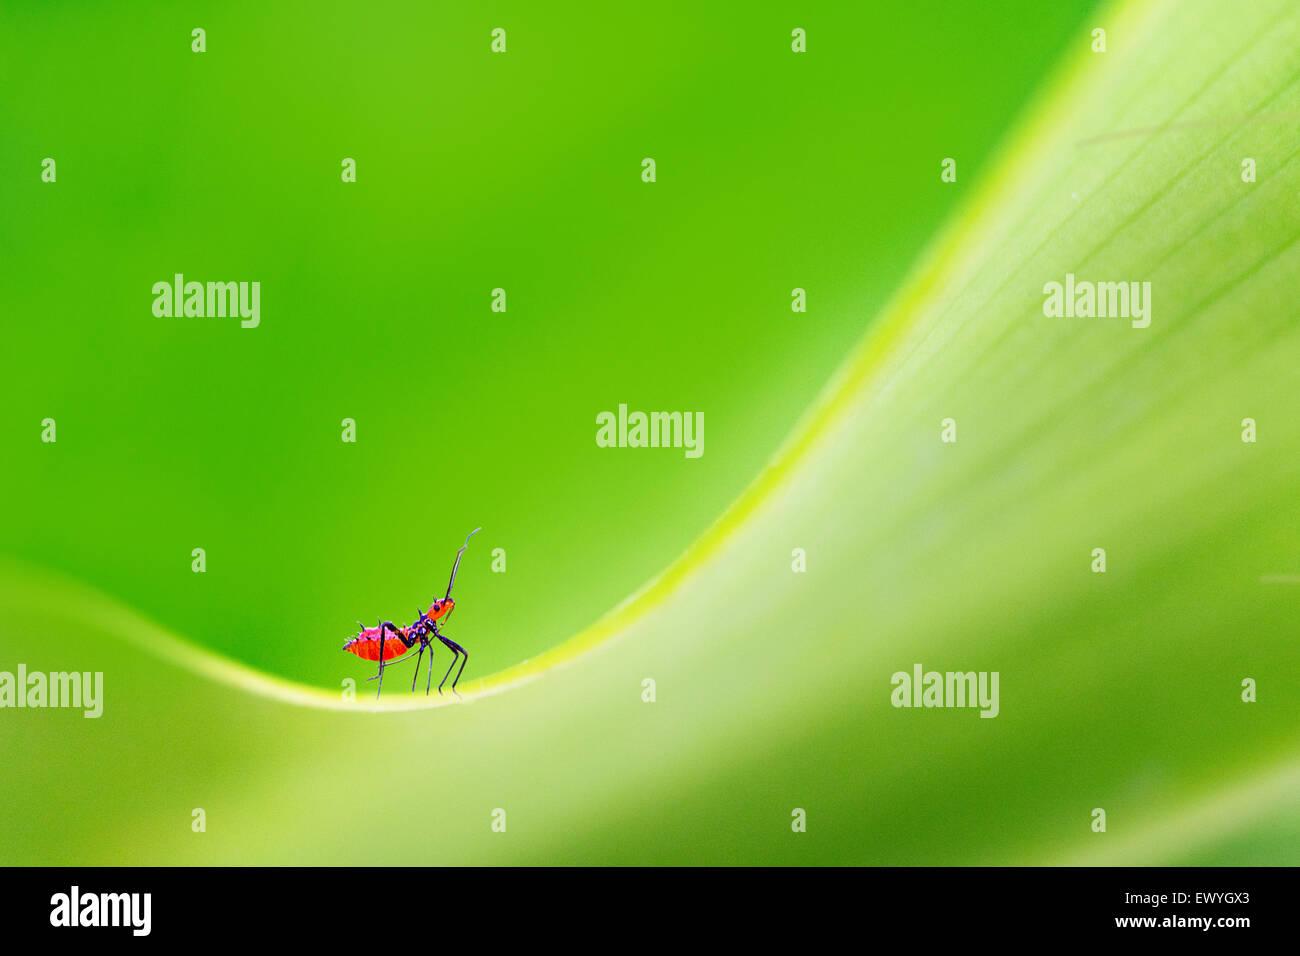 Nahaufnahme eines Insekts, Gorontalo, Indonesien Stockbild